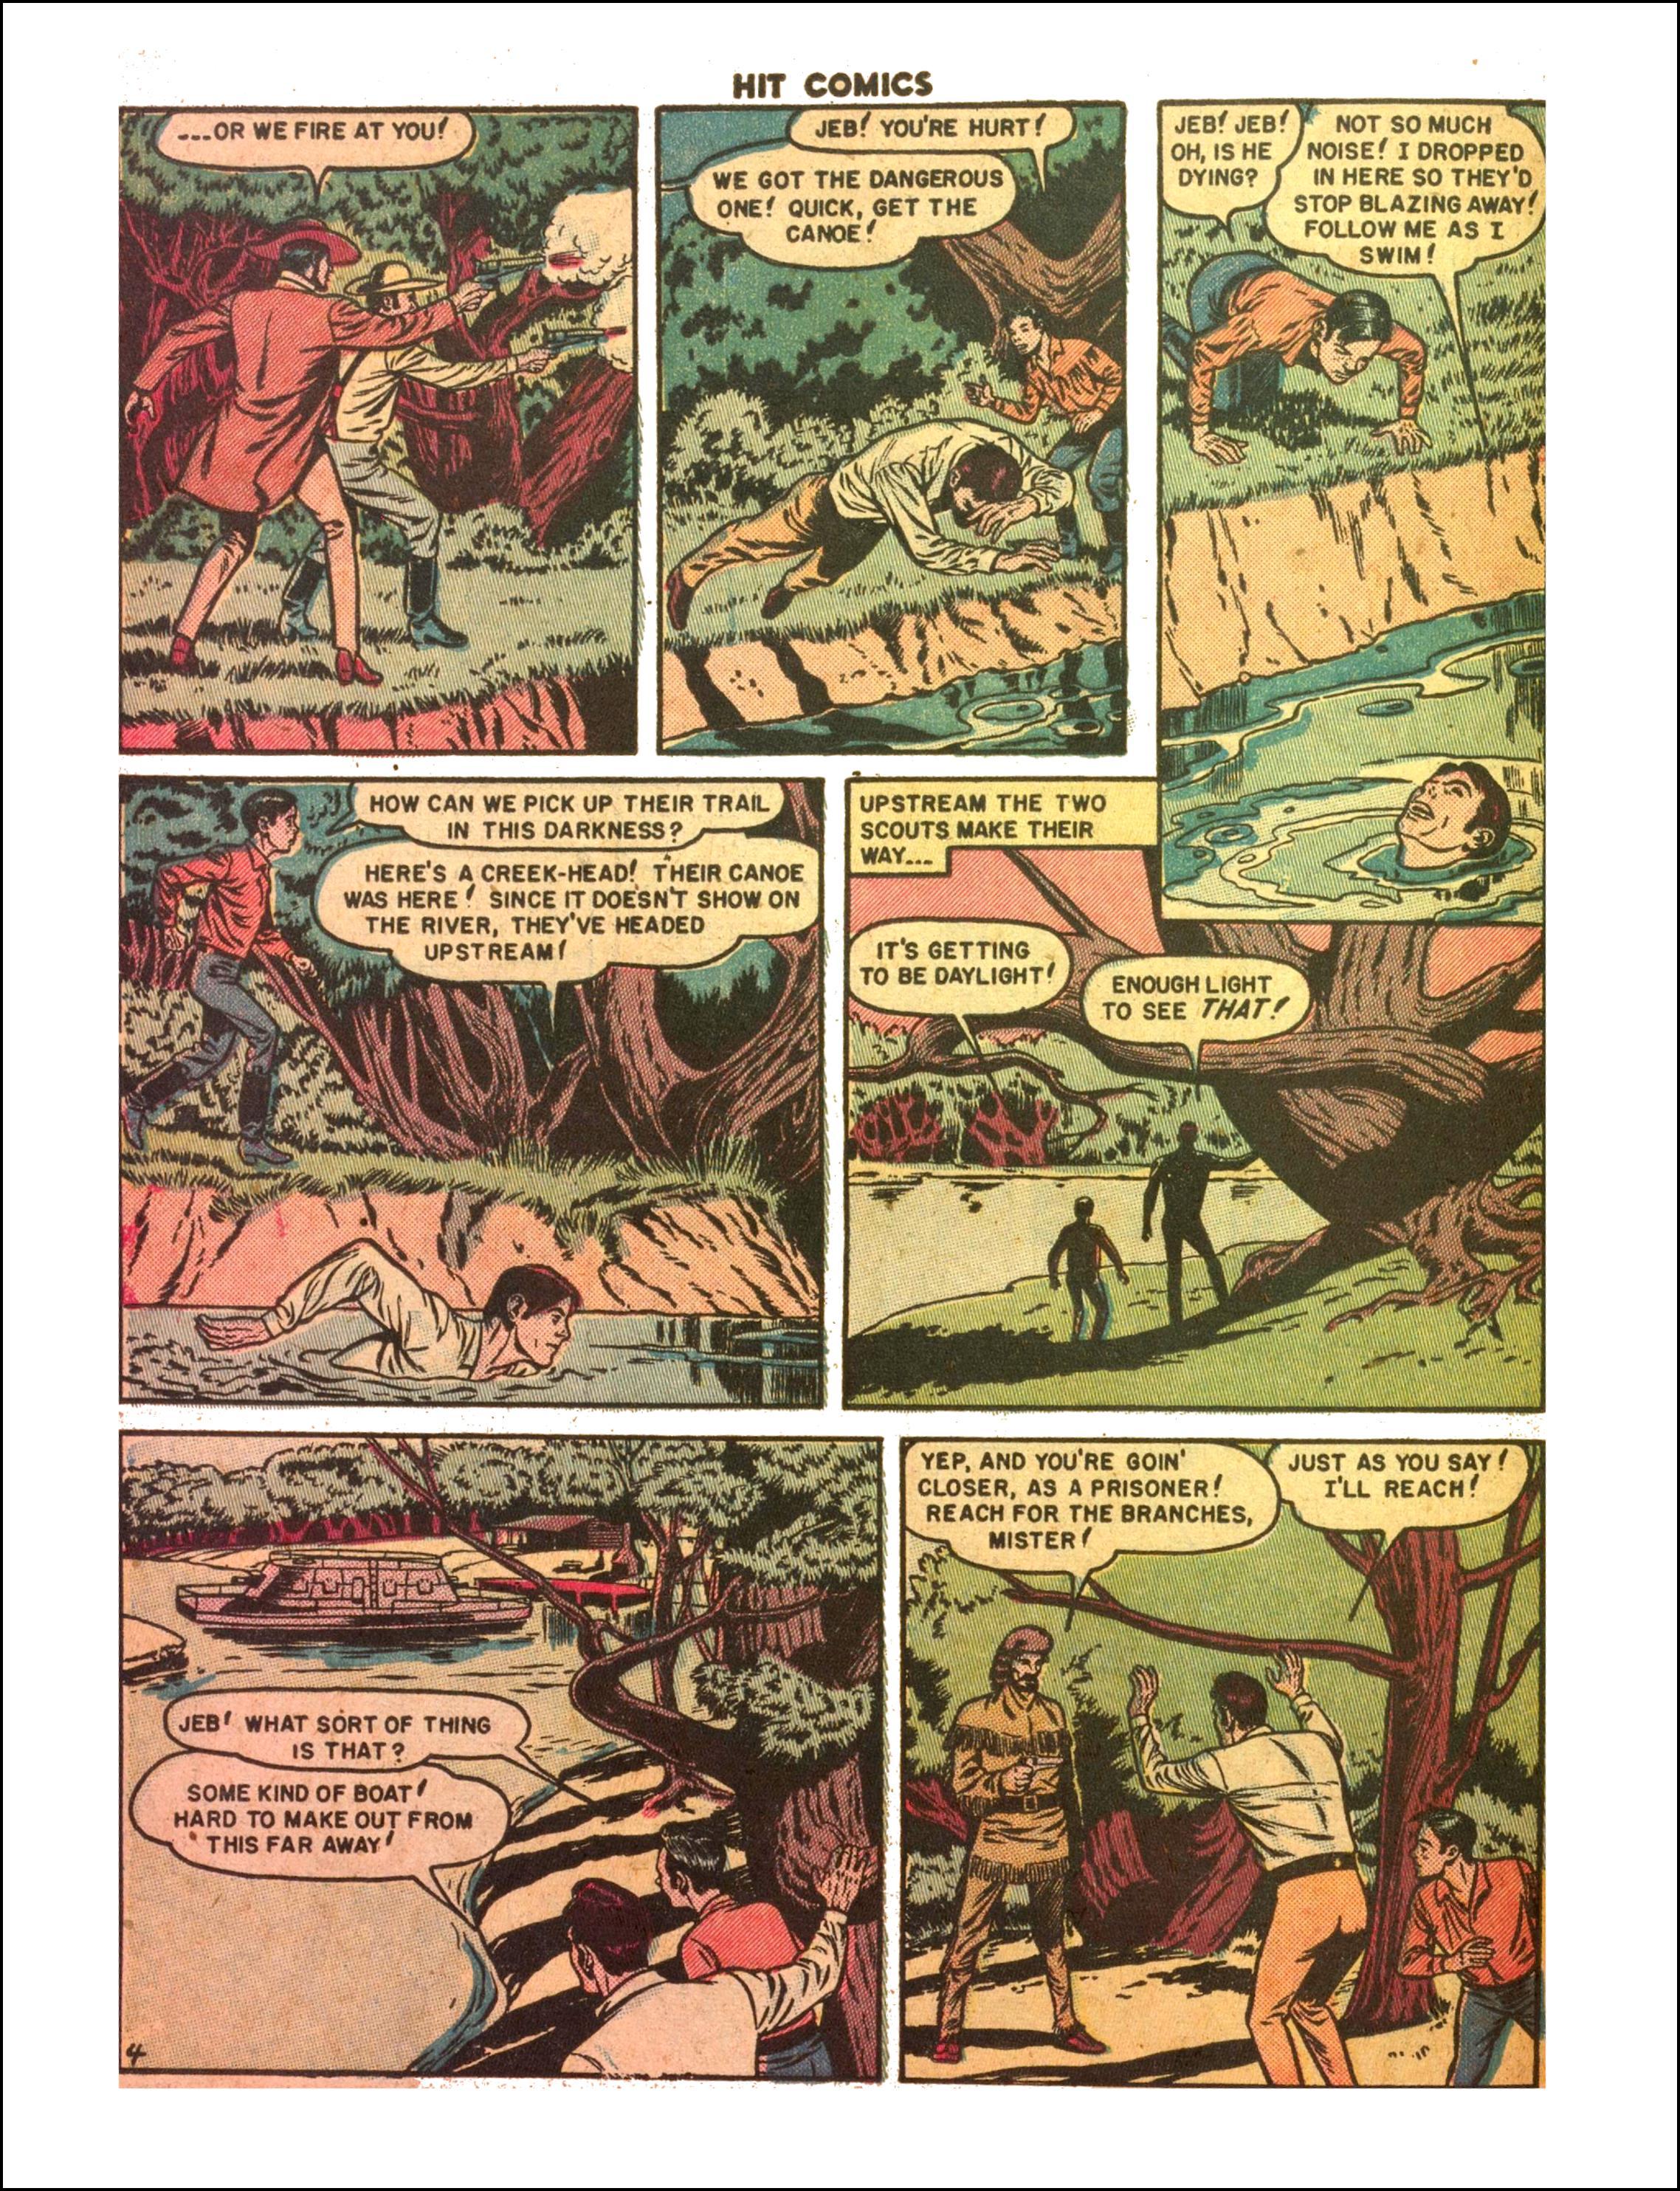 Read online Hit Comics comic -  Issue #65 - 6